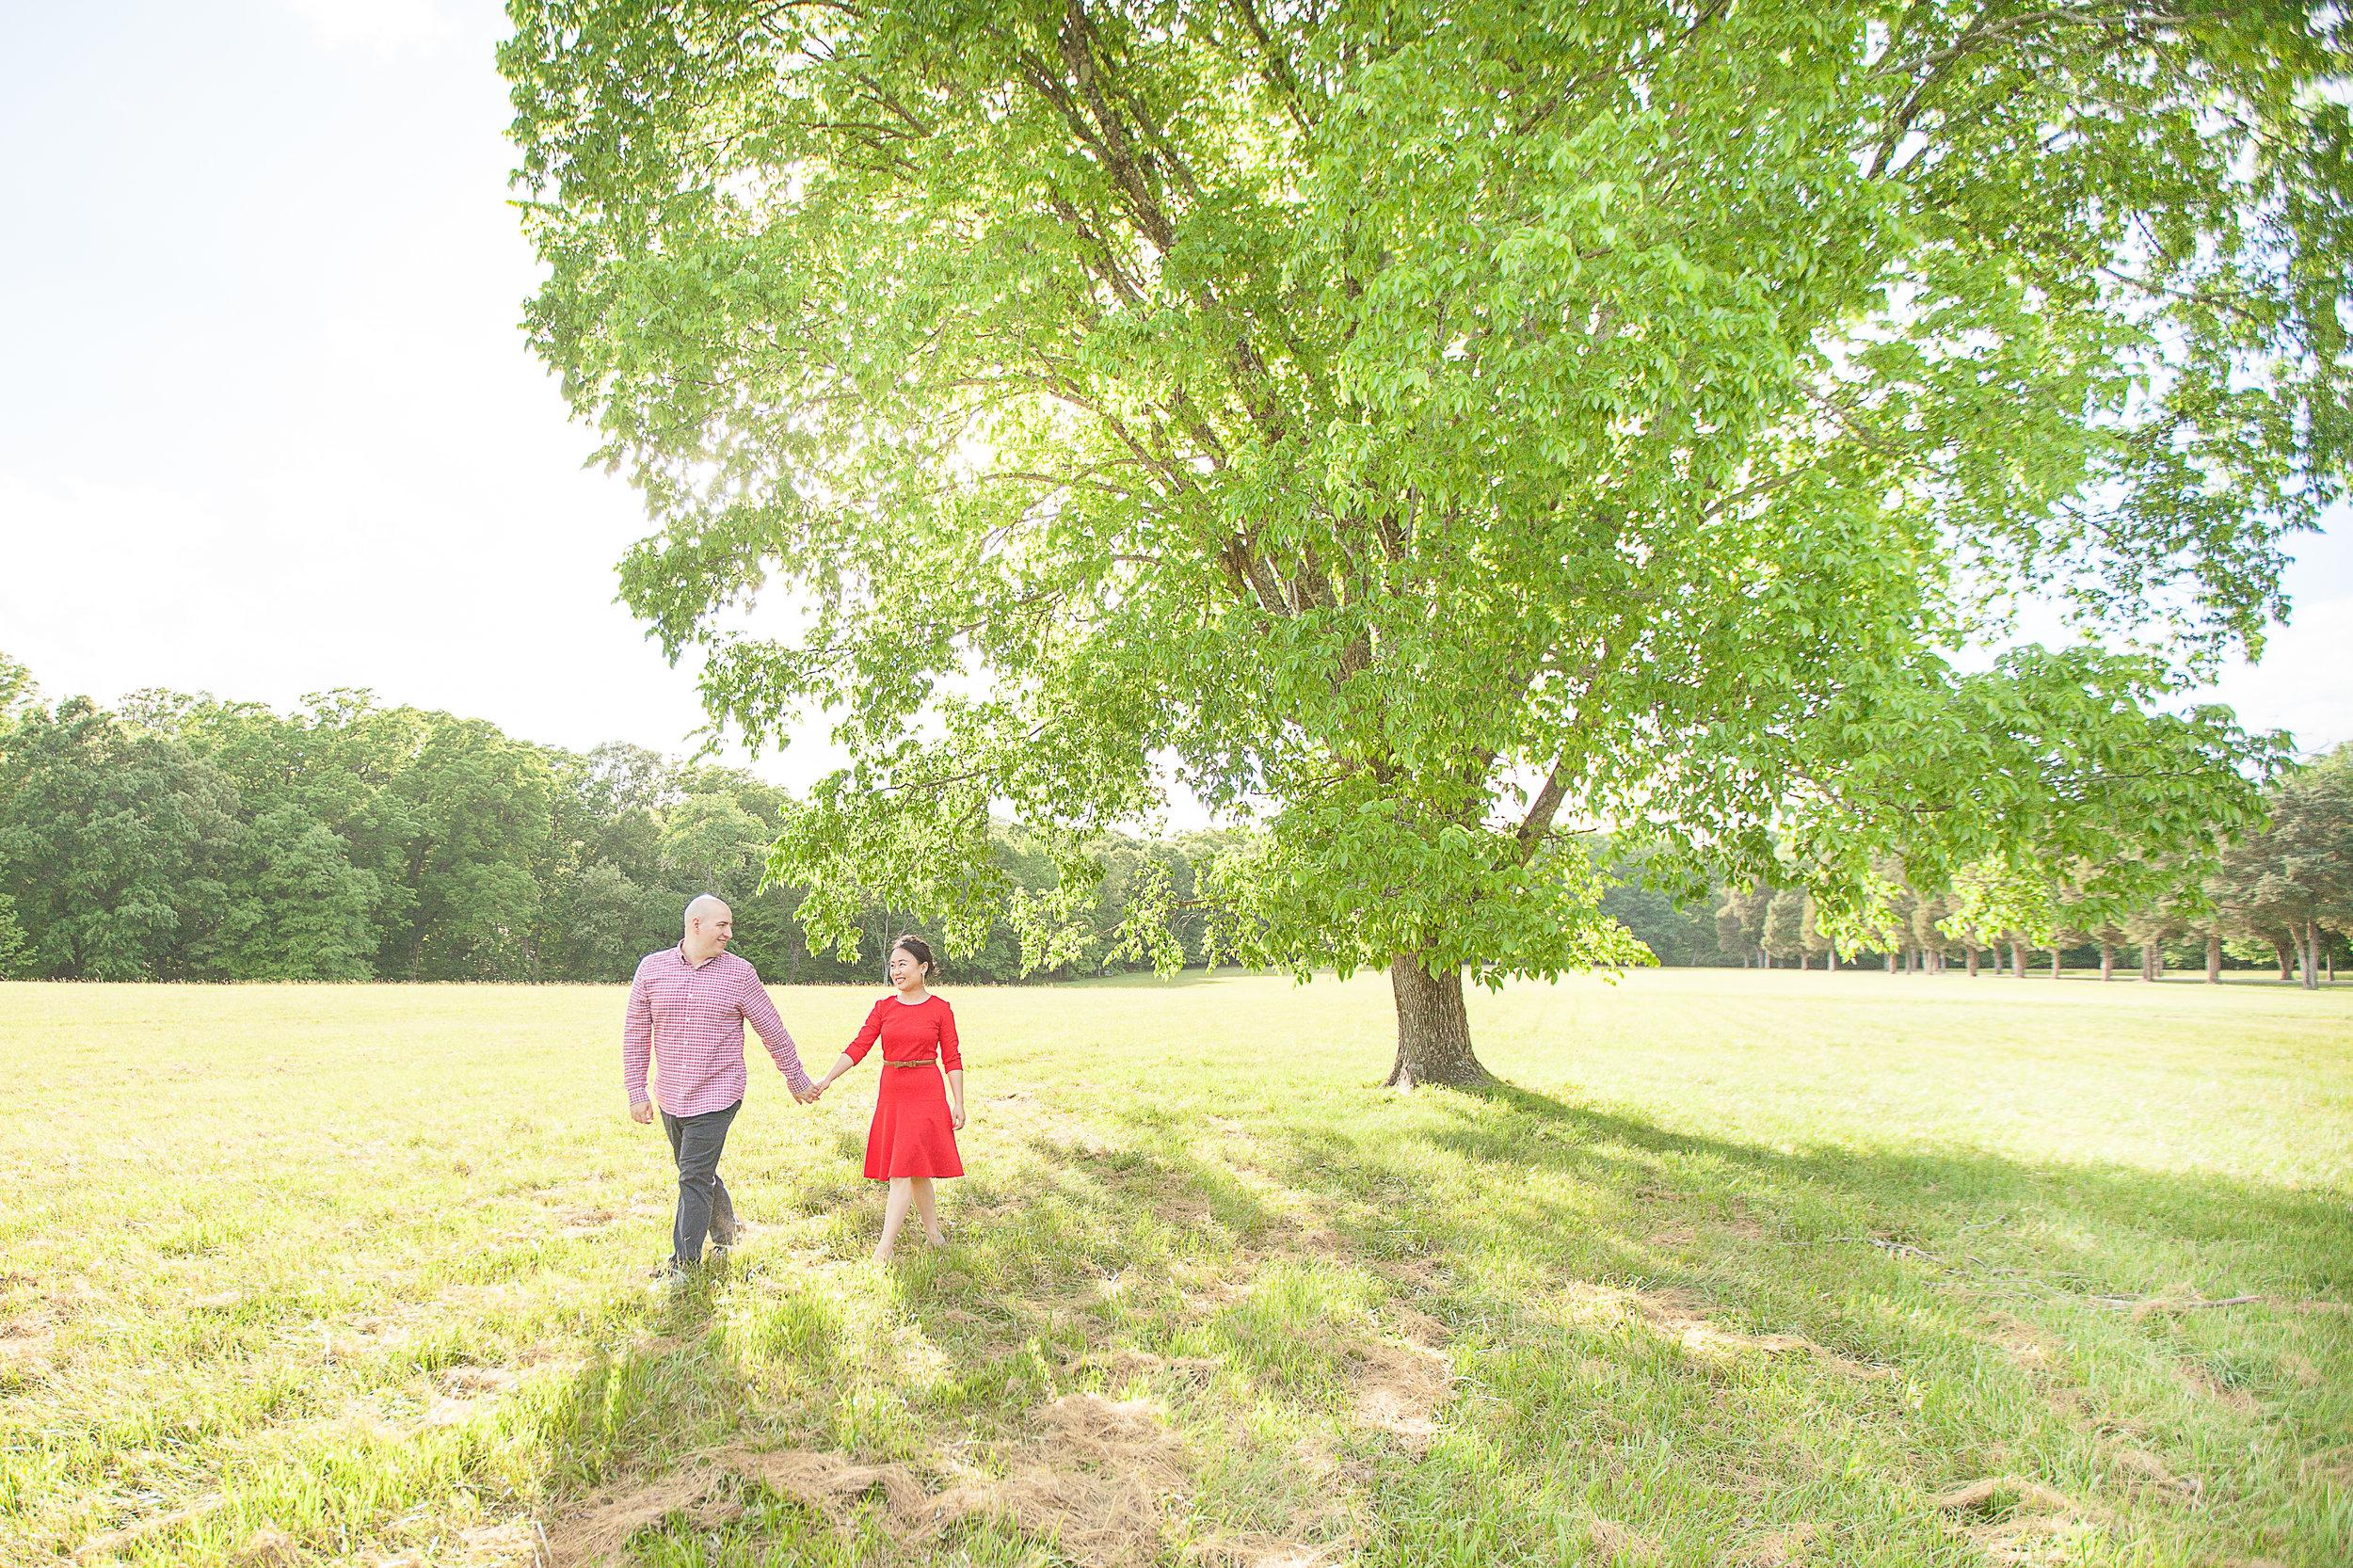 Vera-Tony-Engagement-Kim-Pham-Clark-Photography-115.jpg